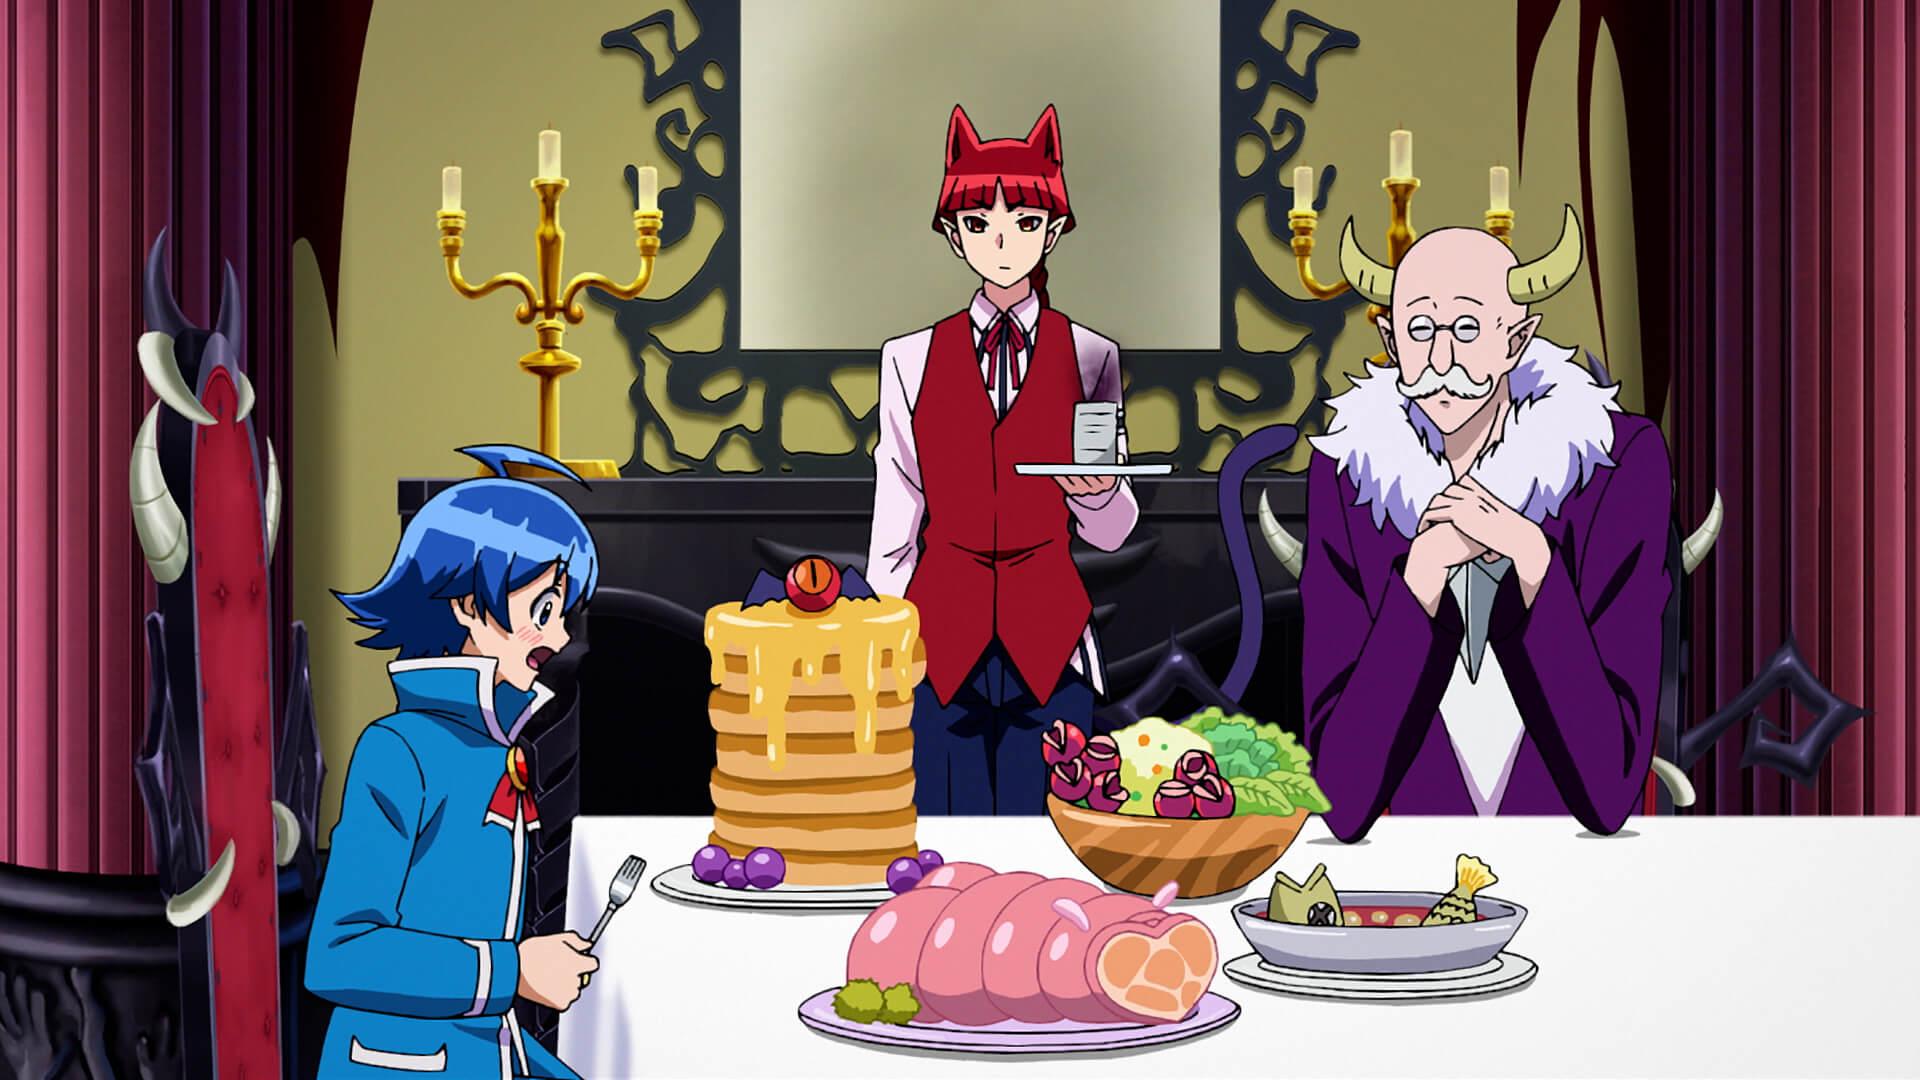 『SHAMAN KING』、『極主夫道』、『転スラ日記』など話題作目白押し!Netflix4月配信のアニメラインナップが解禁 art210326_netflix_anime_1